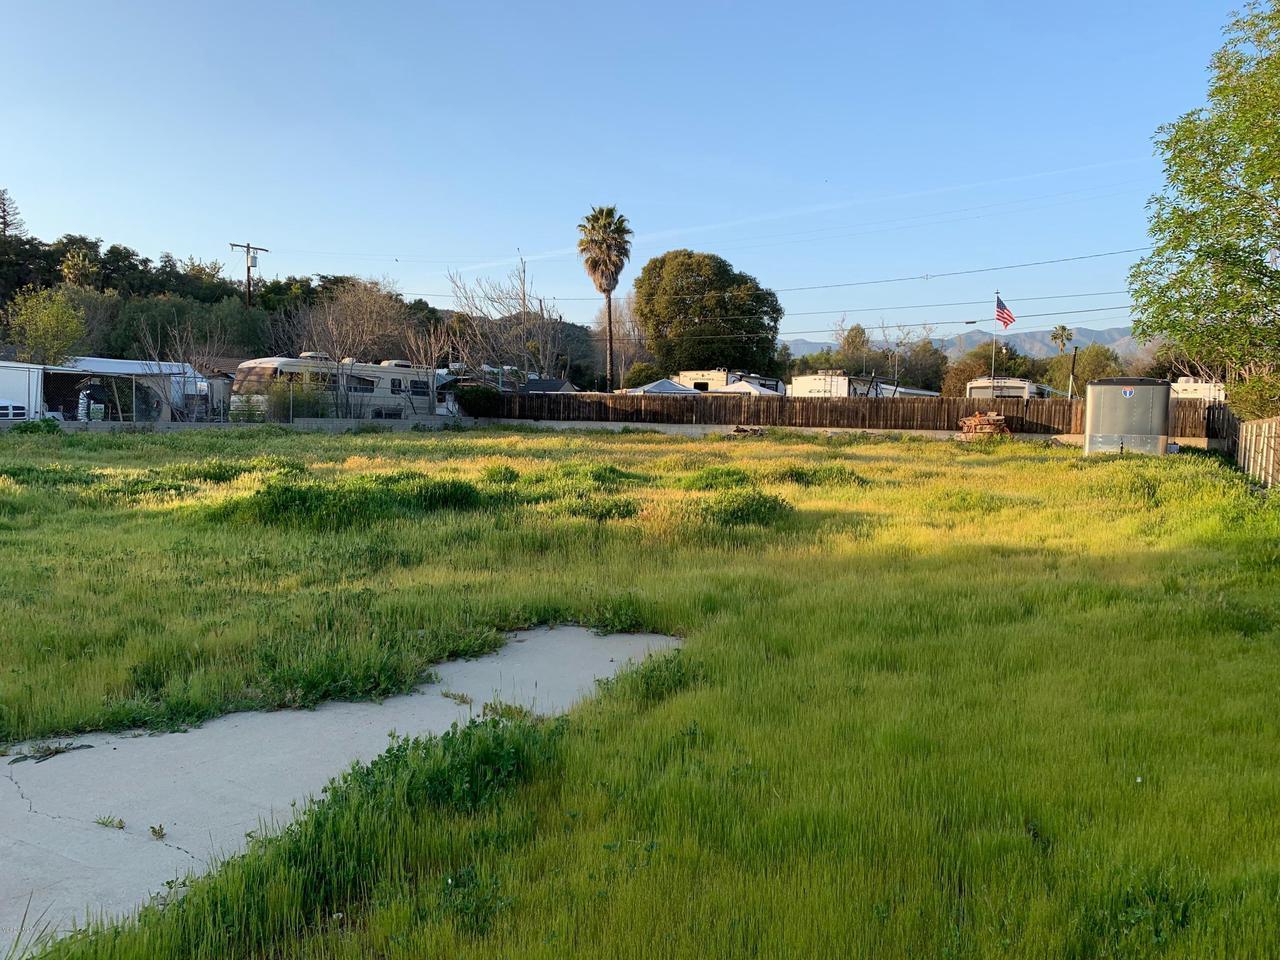 191 GRAPEVINE, Oak View, CA 93022 - IMG-0499